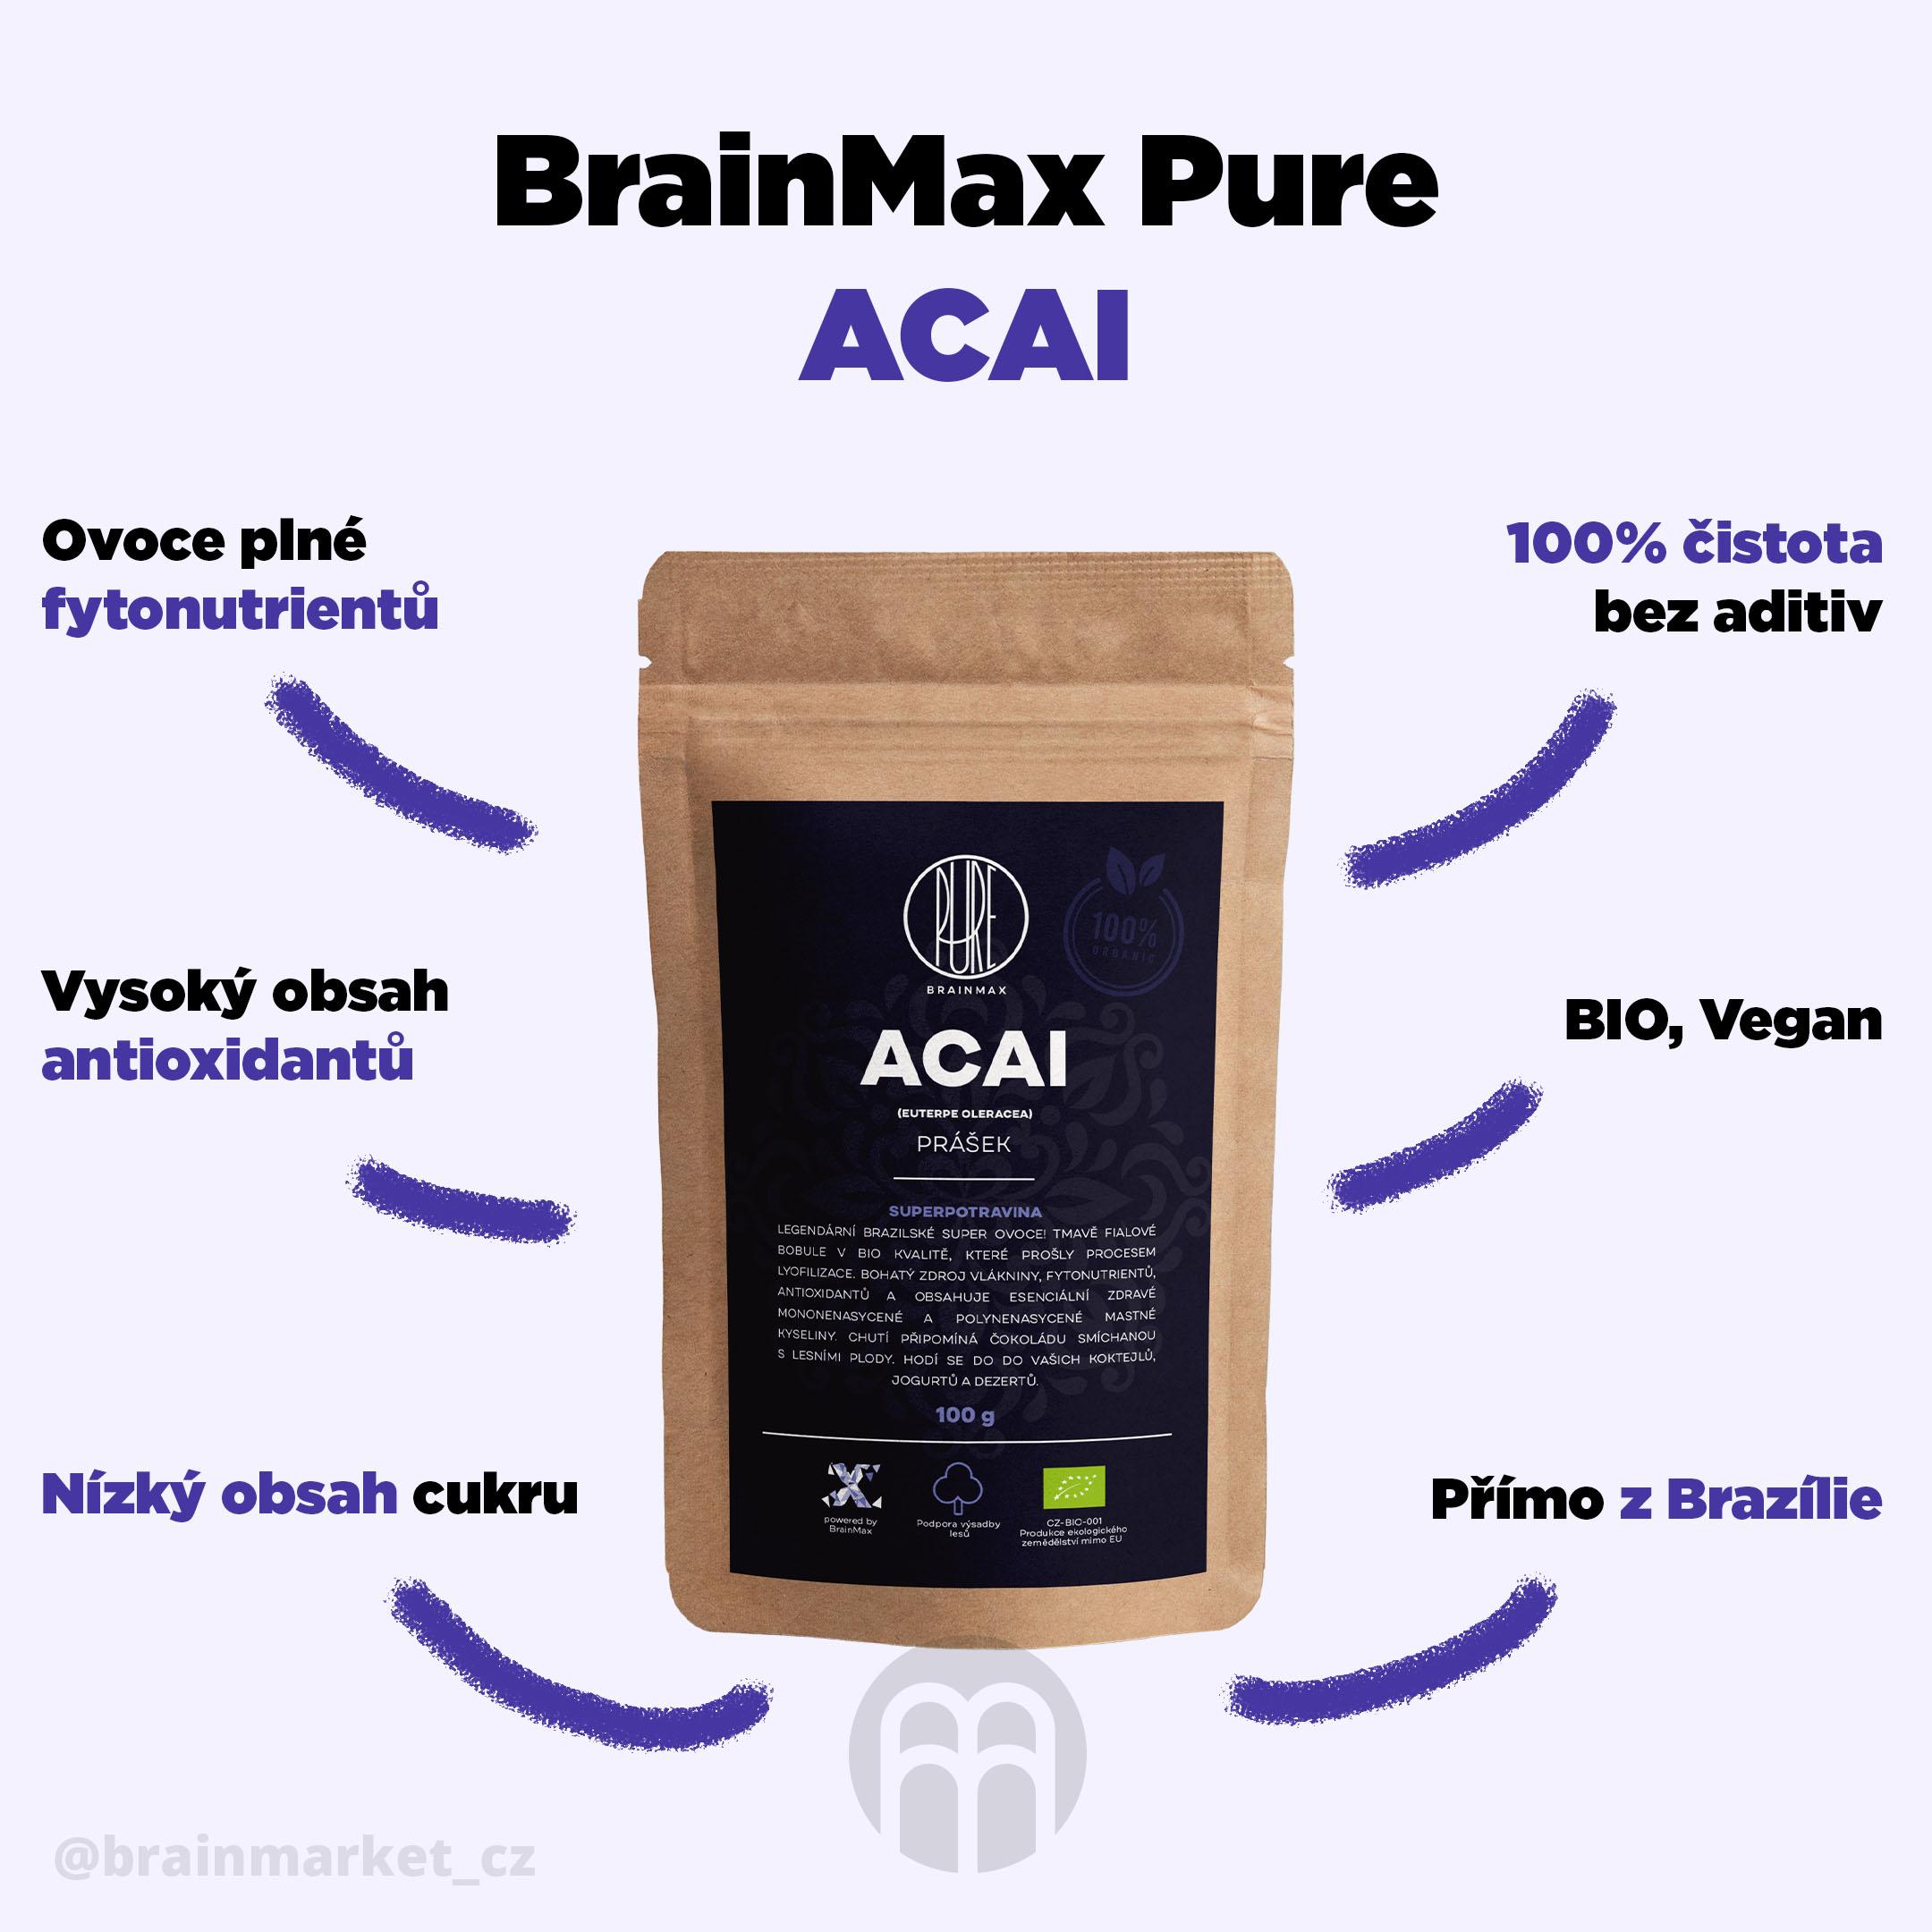 branimax-pure-acai-infografika-brainmarket-cz